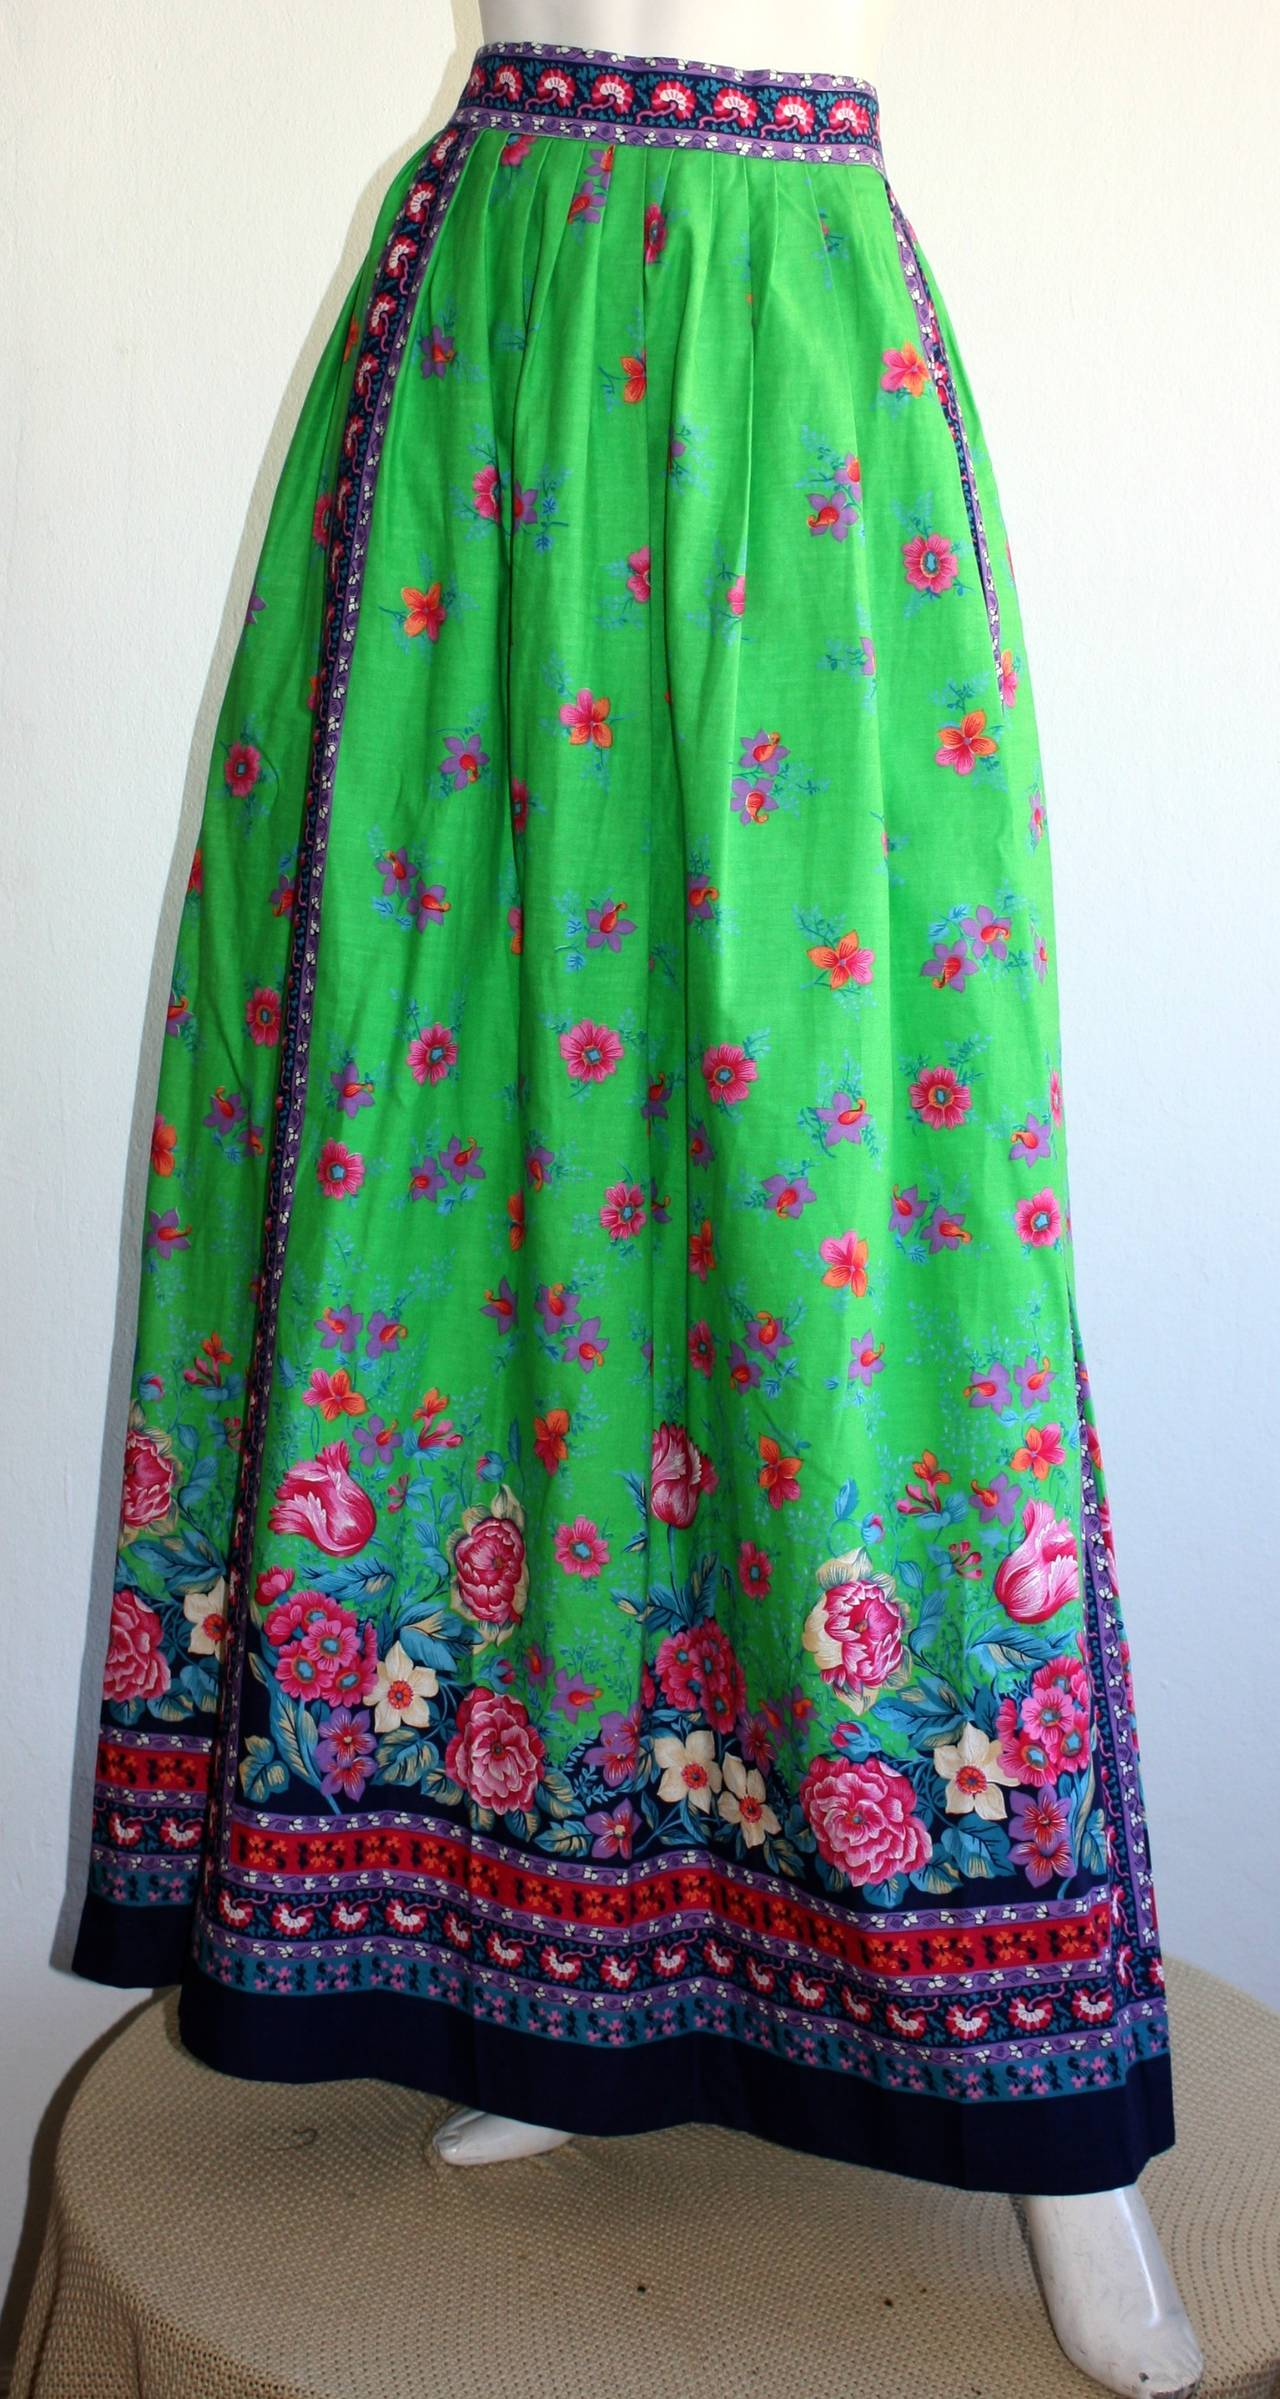 1960s Vintage Tina Leser Green Floral Print 2 - Piece Dress Ensemble For Sale 2